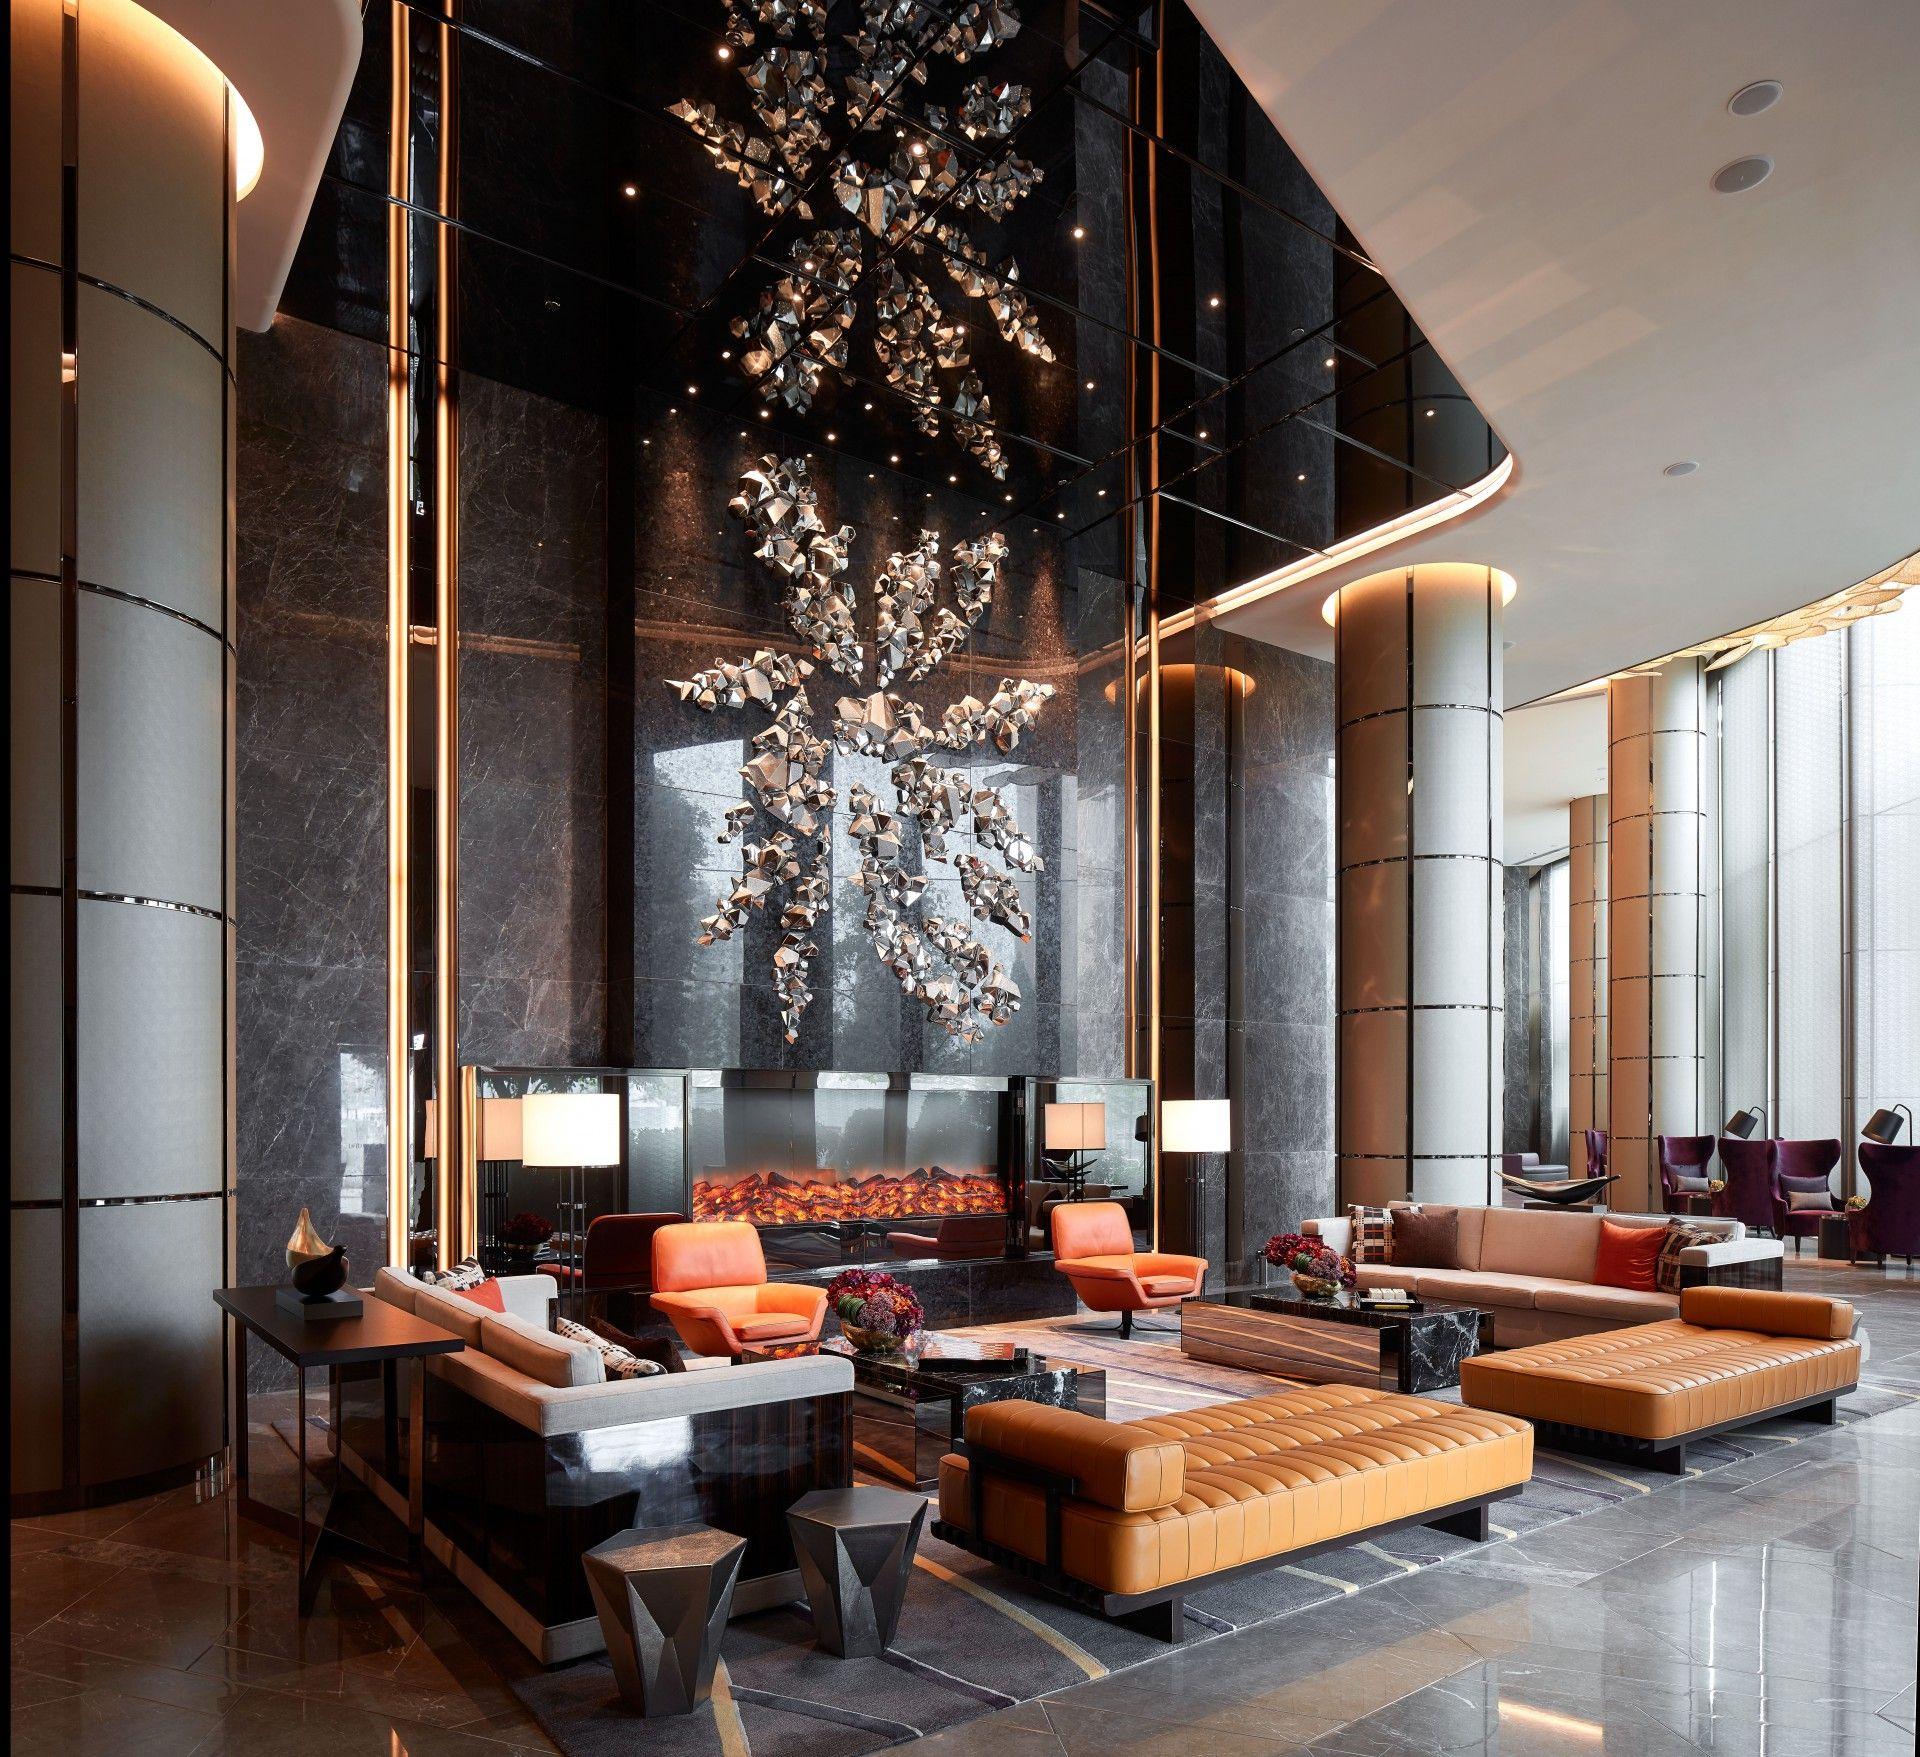 Lobby Inspirations Ultima Residential Project By Hba Los Angeles Lobby Interior Design Lobby Design Hotel Lobby Design